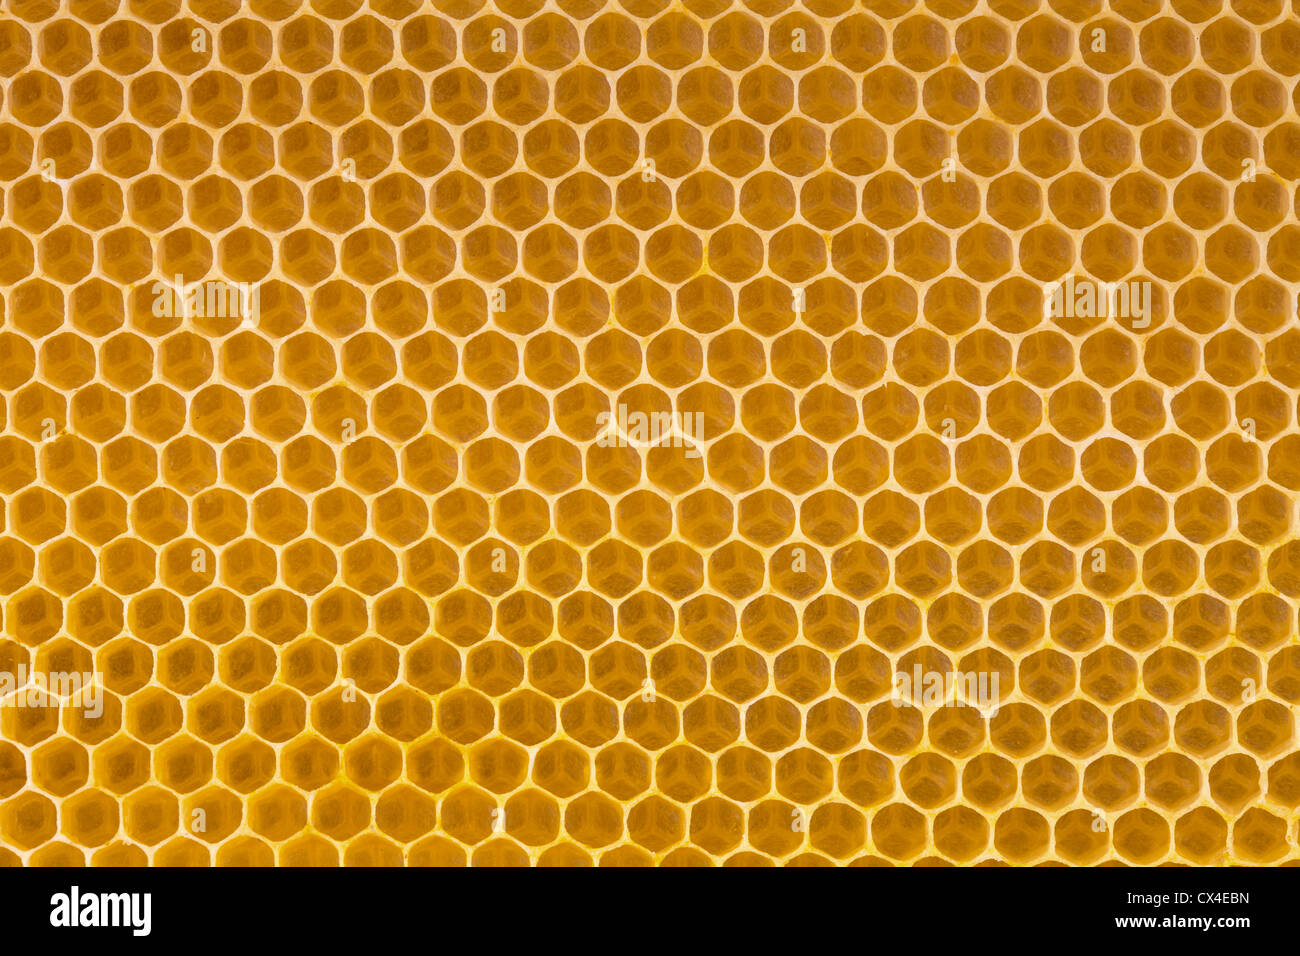 bee honey in honeycomb - Stock Image